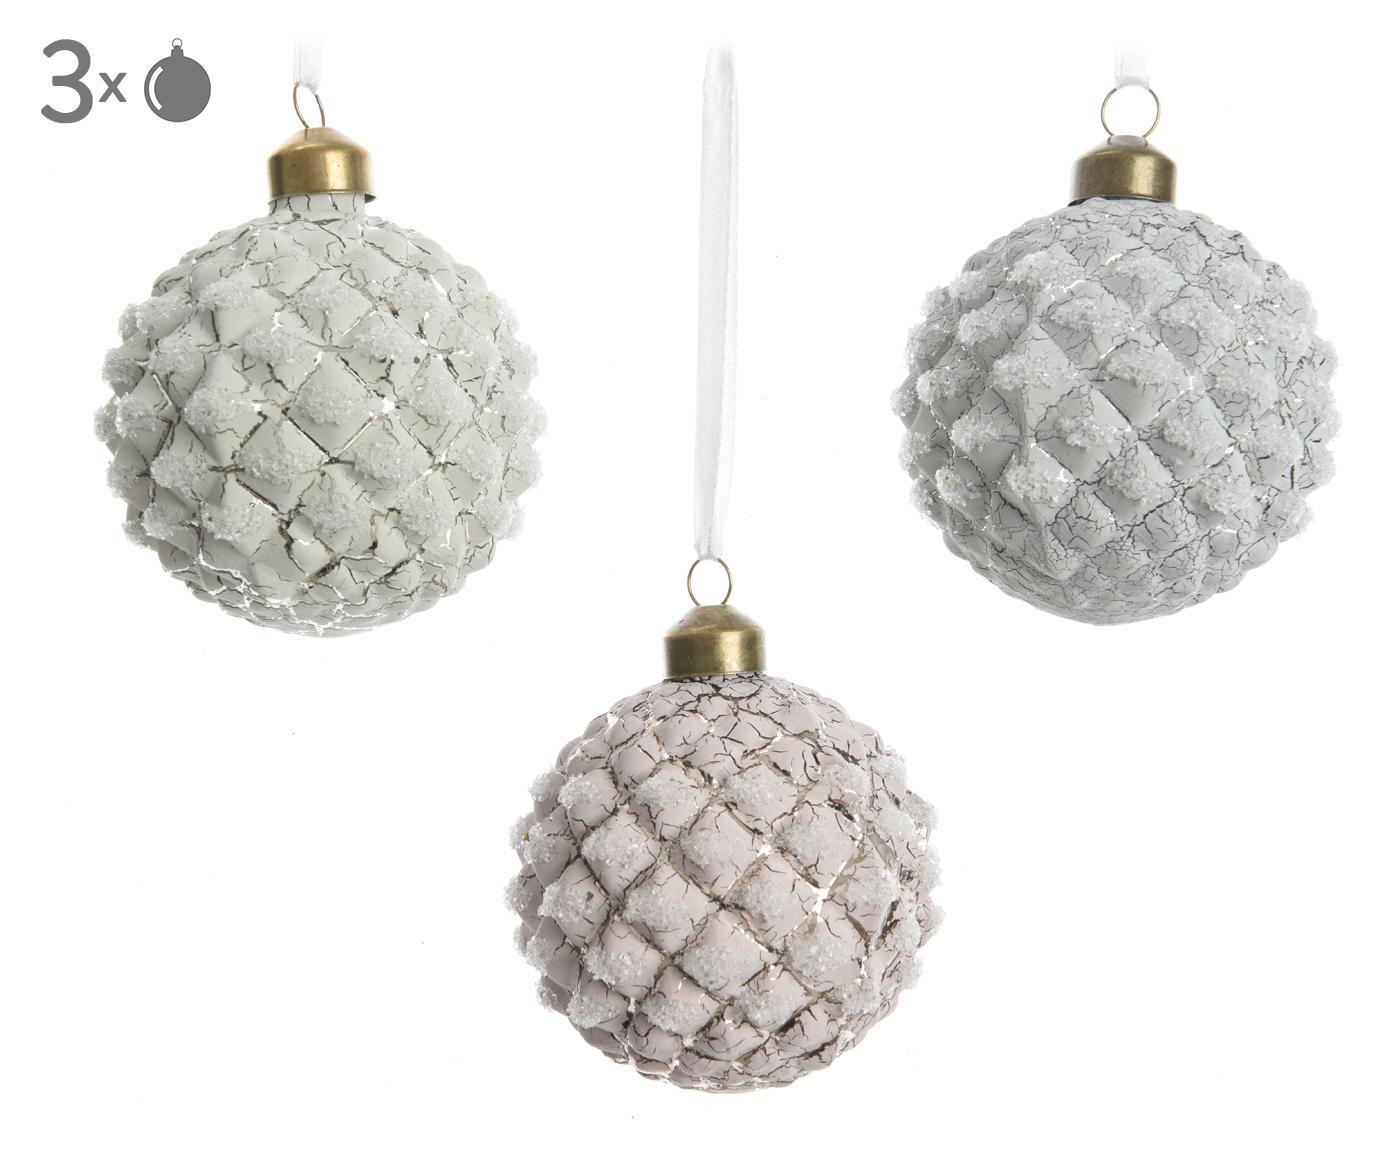 Set de bolas de Navidad Crackle, 3pzas., Blanco, plateado, Ø 8 cm